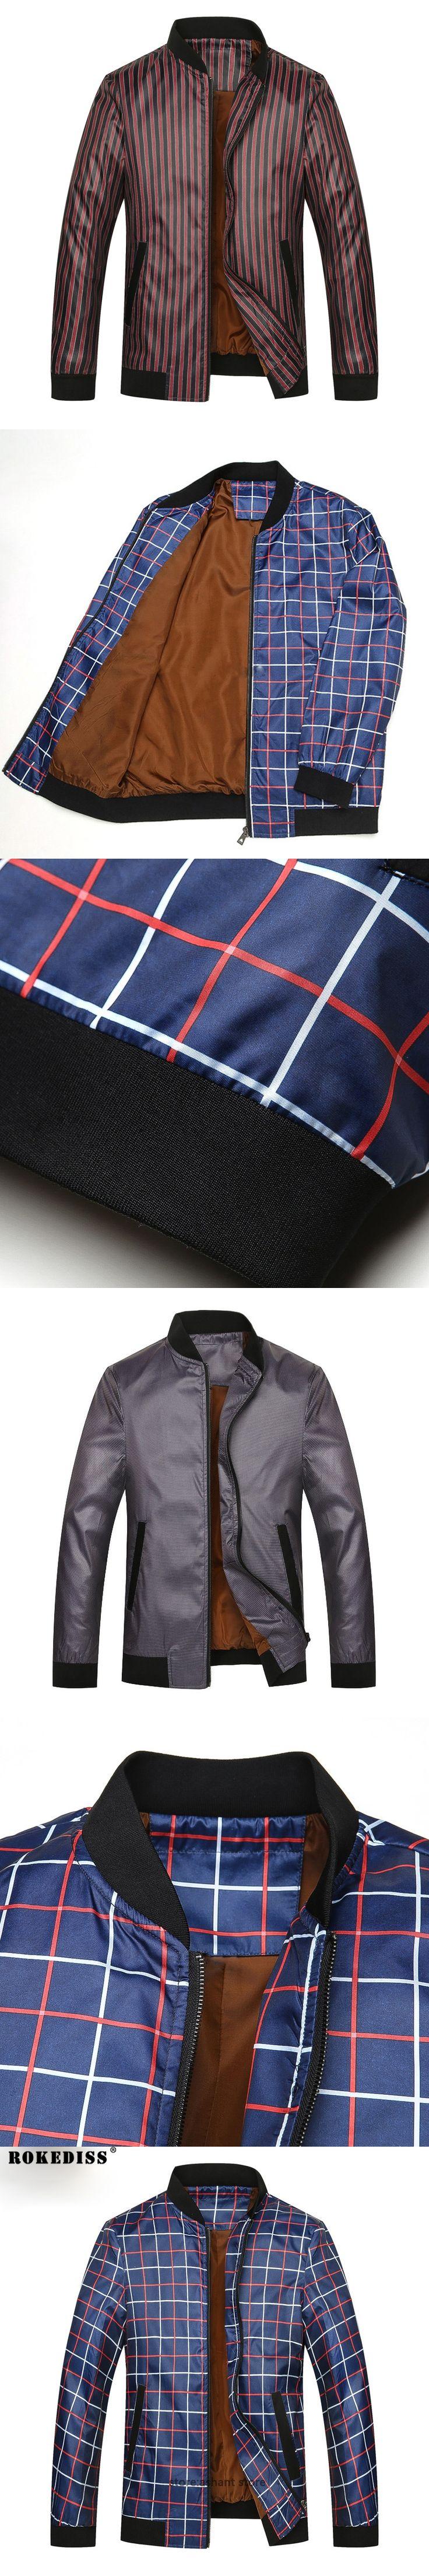 2016 Men's Lightweight Jacket Fashion Casual Plus King Size Mandarin Collar Purple Red Regular Overcoats TC514